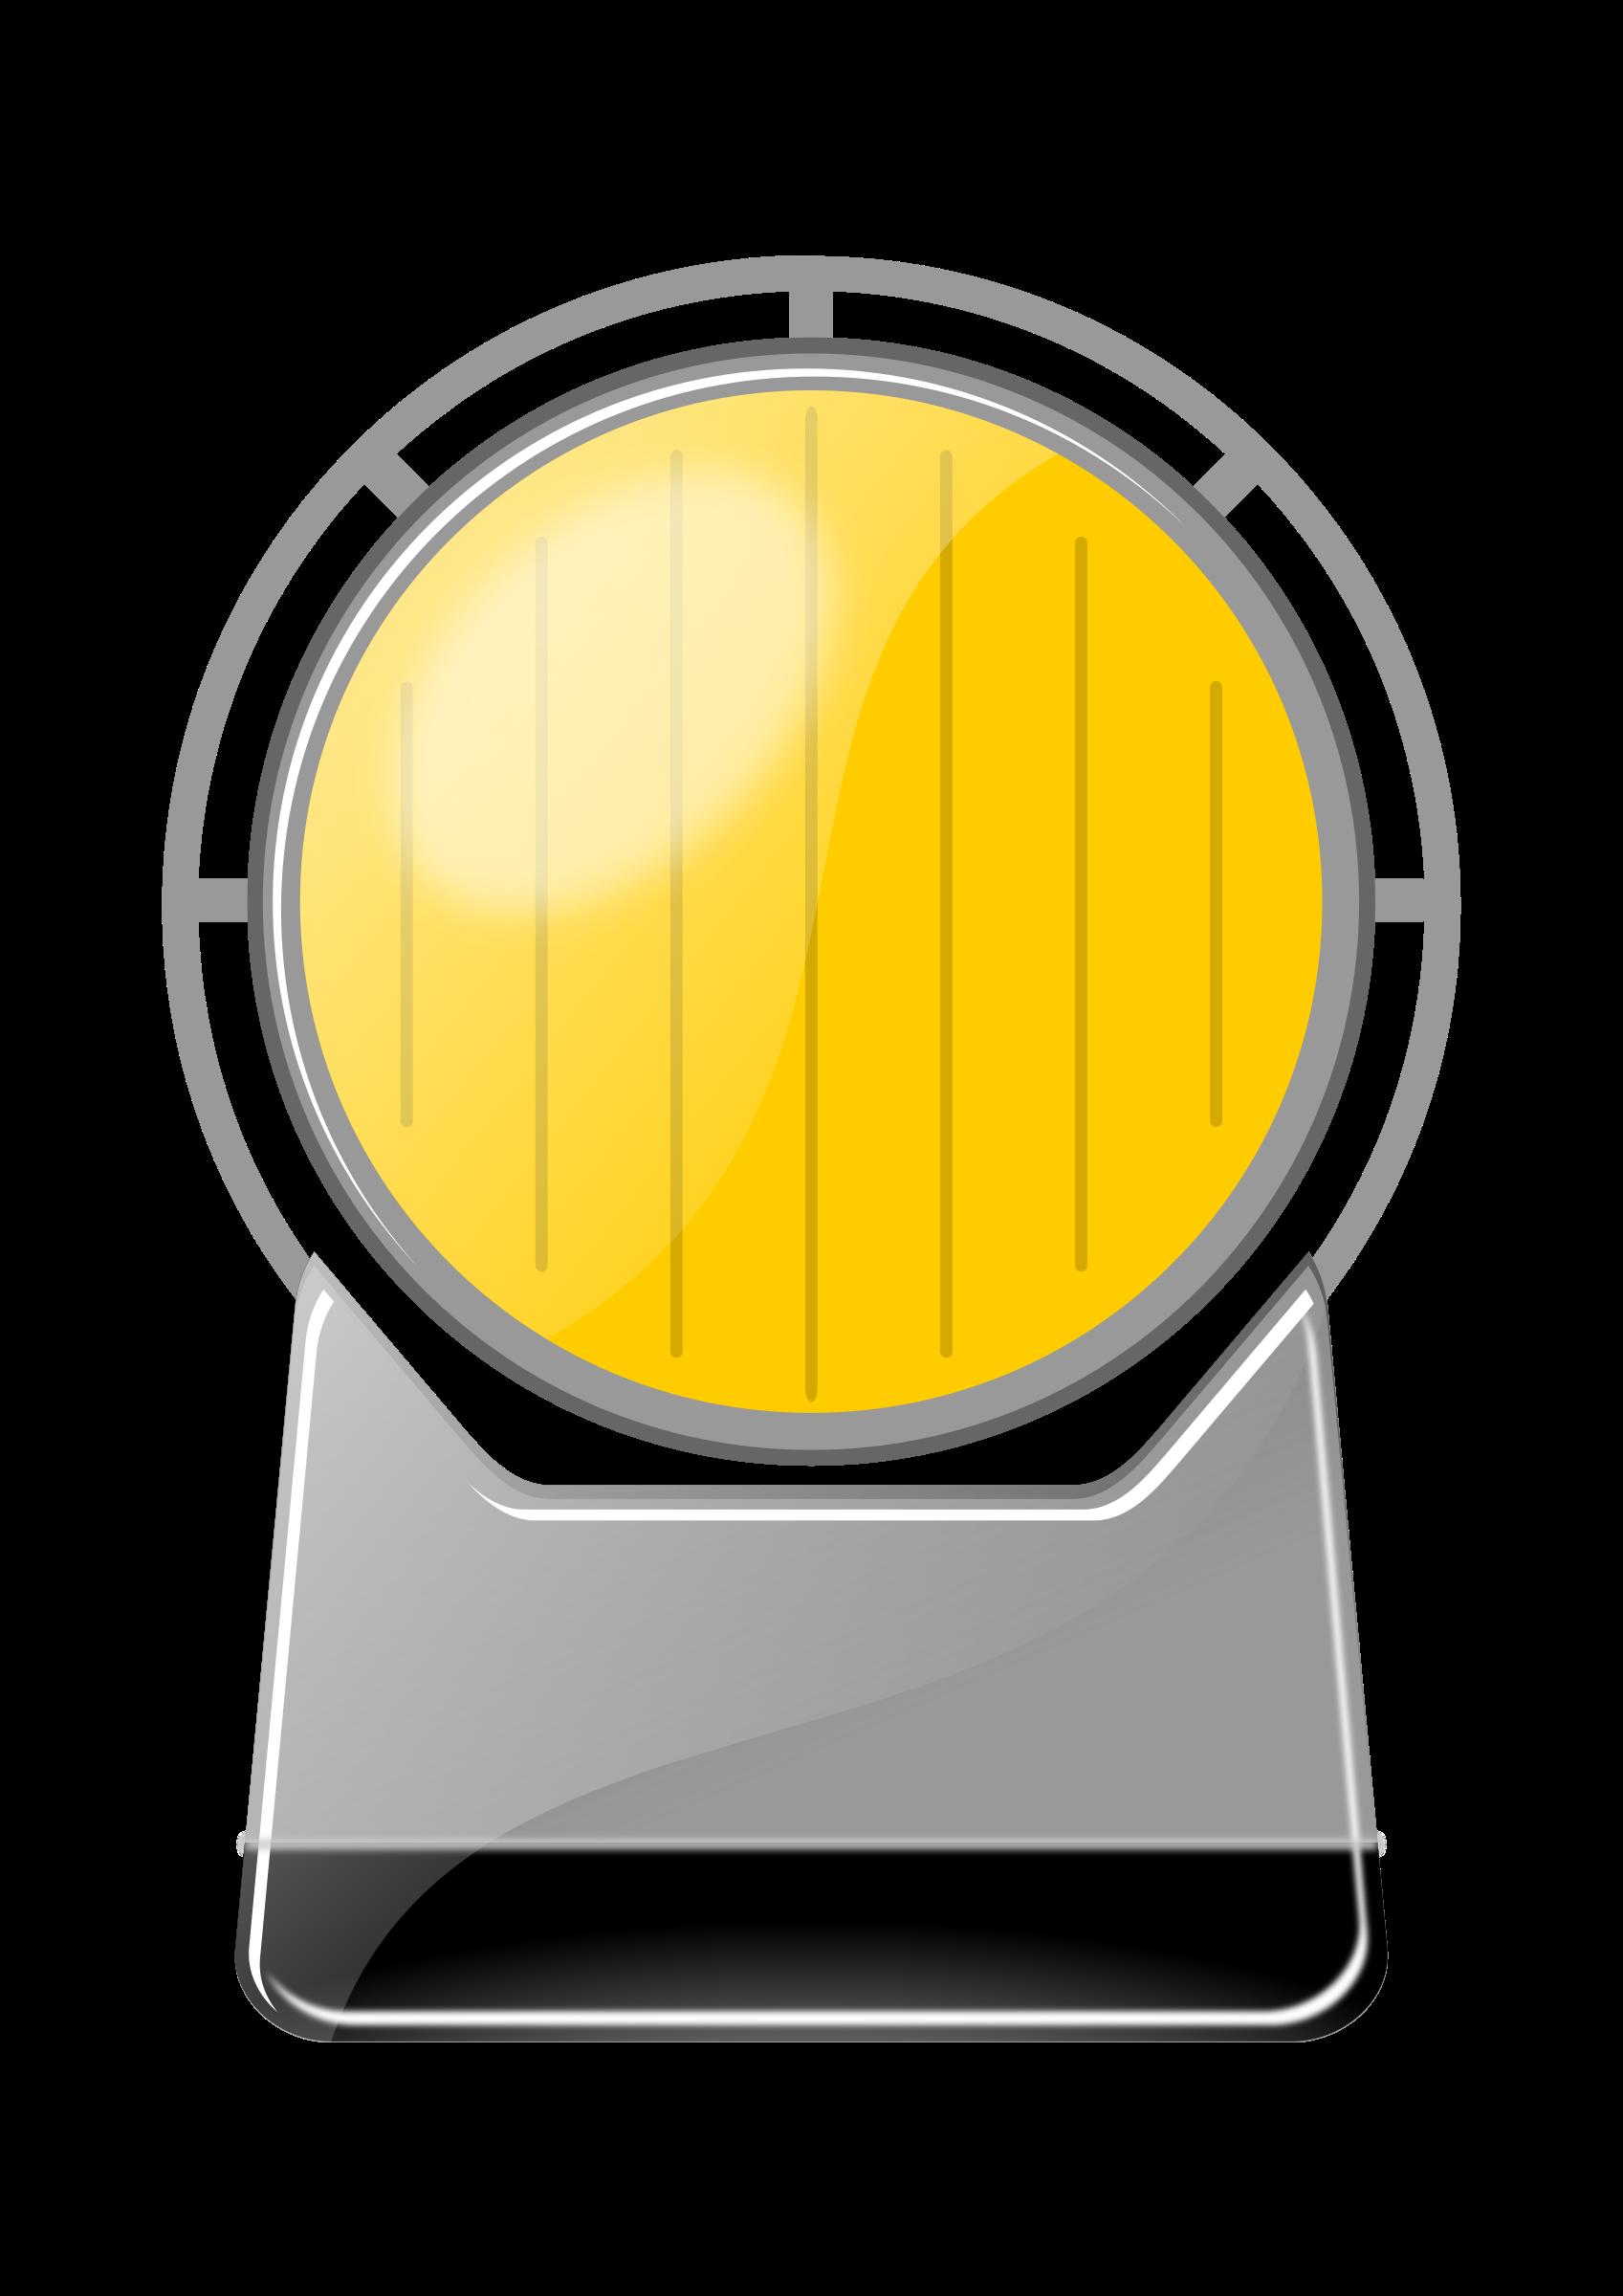 Roadworks big image png. Flash clipart symbol